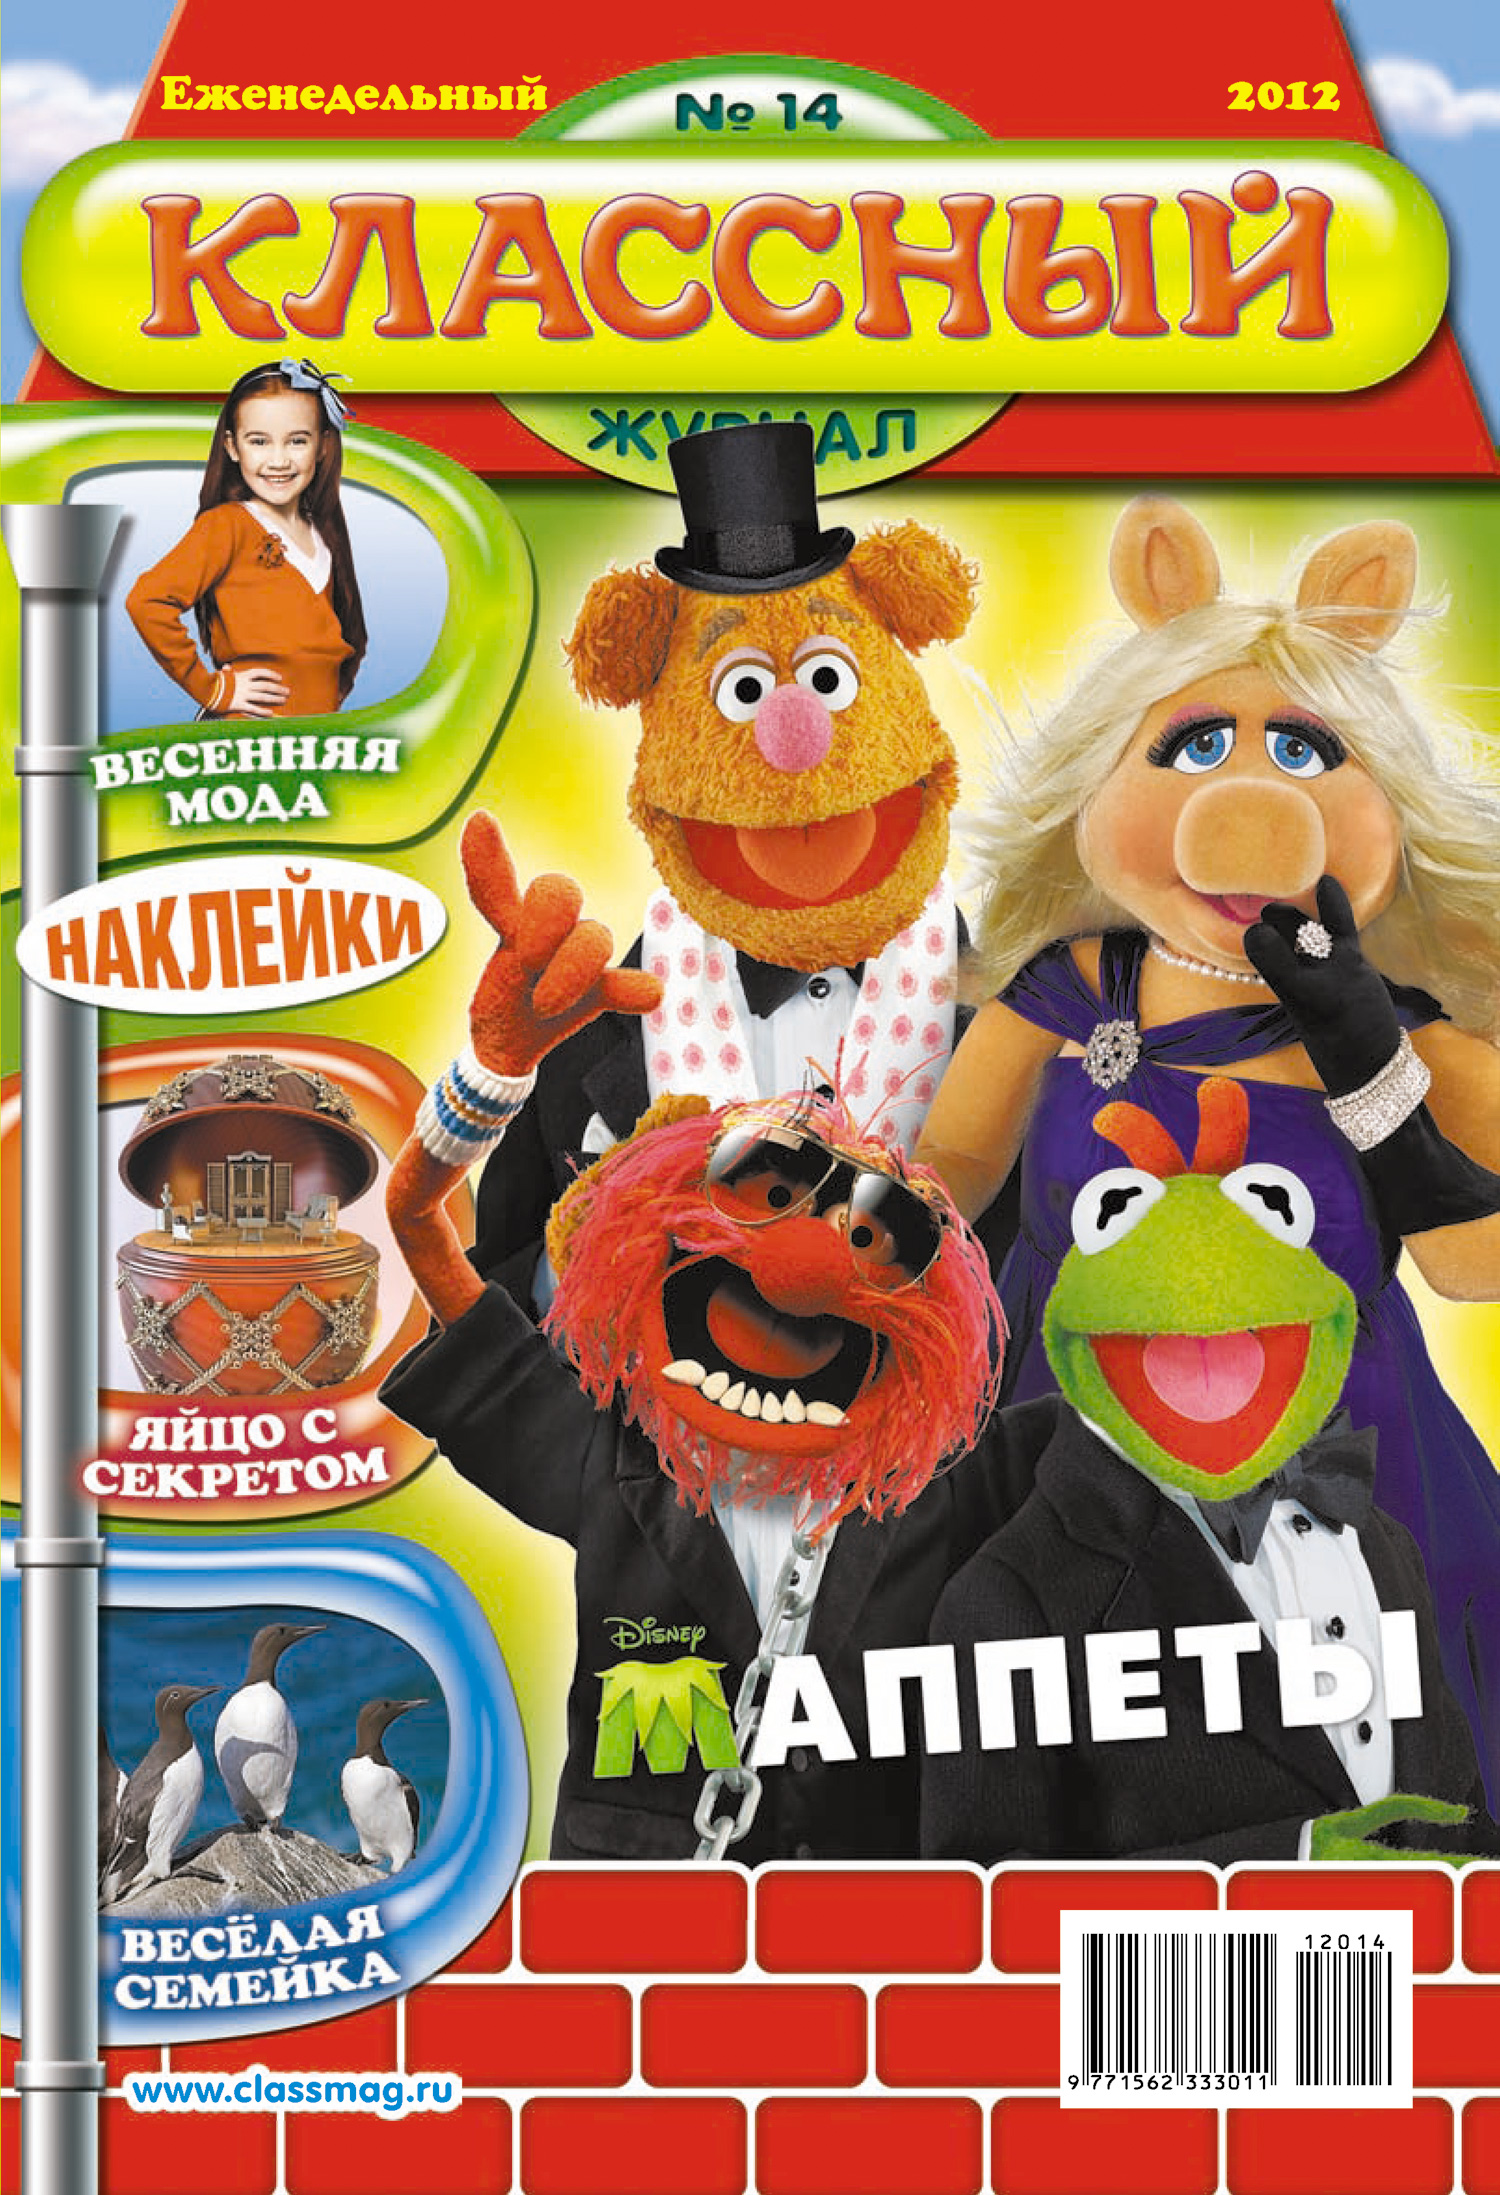 Классный журнал №14/2012